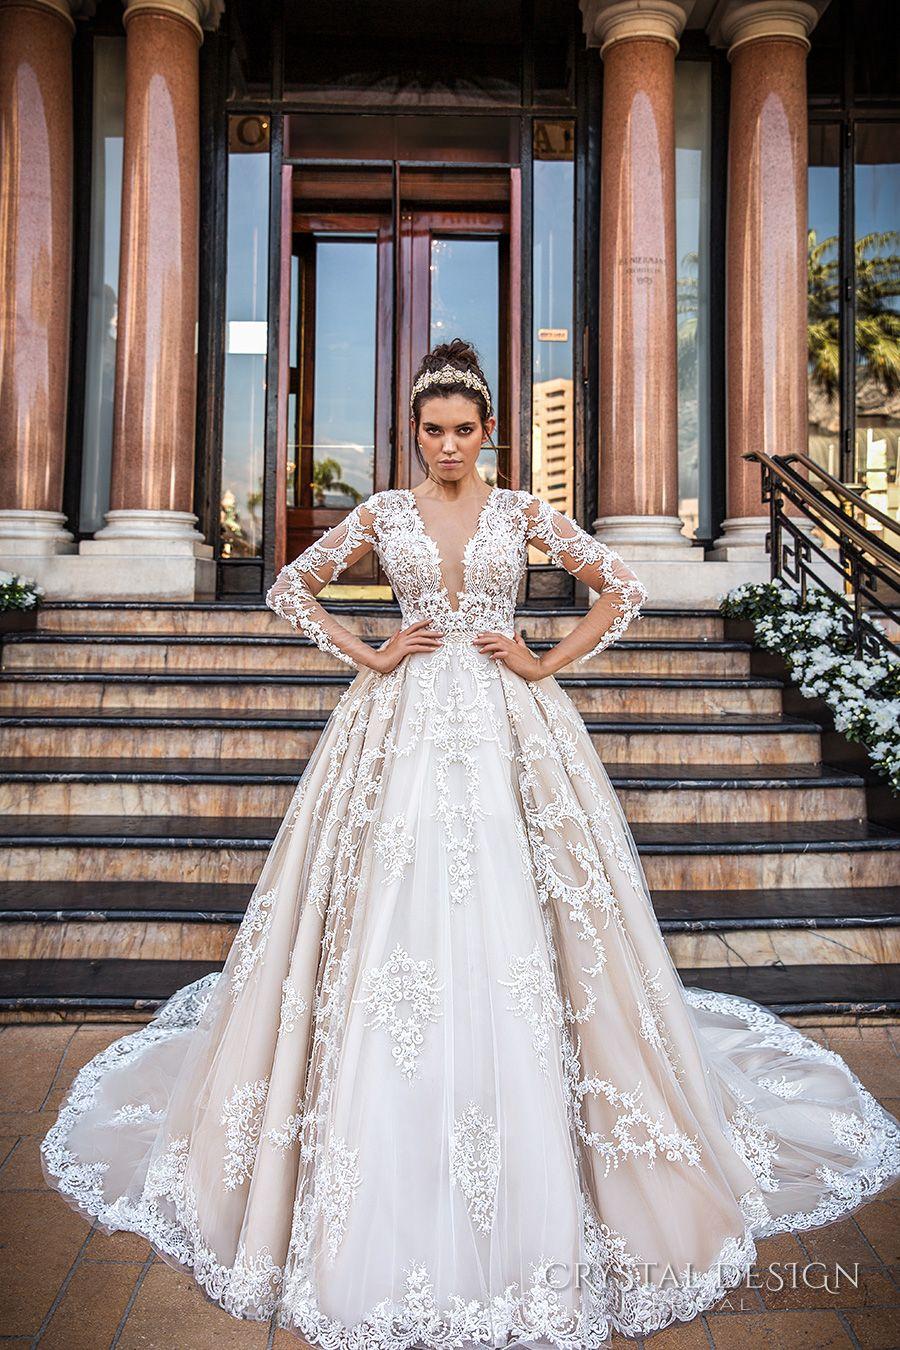 22235ea59e9712 crystal design 2017 bridal long sleeves deep plunging v neck full  embellishment bodice princess sexy ball gown a line wedding dress keyhole  back monarch ...